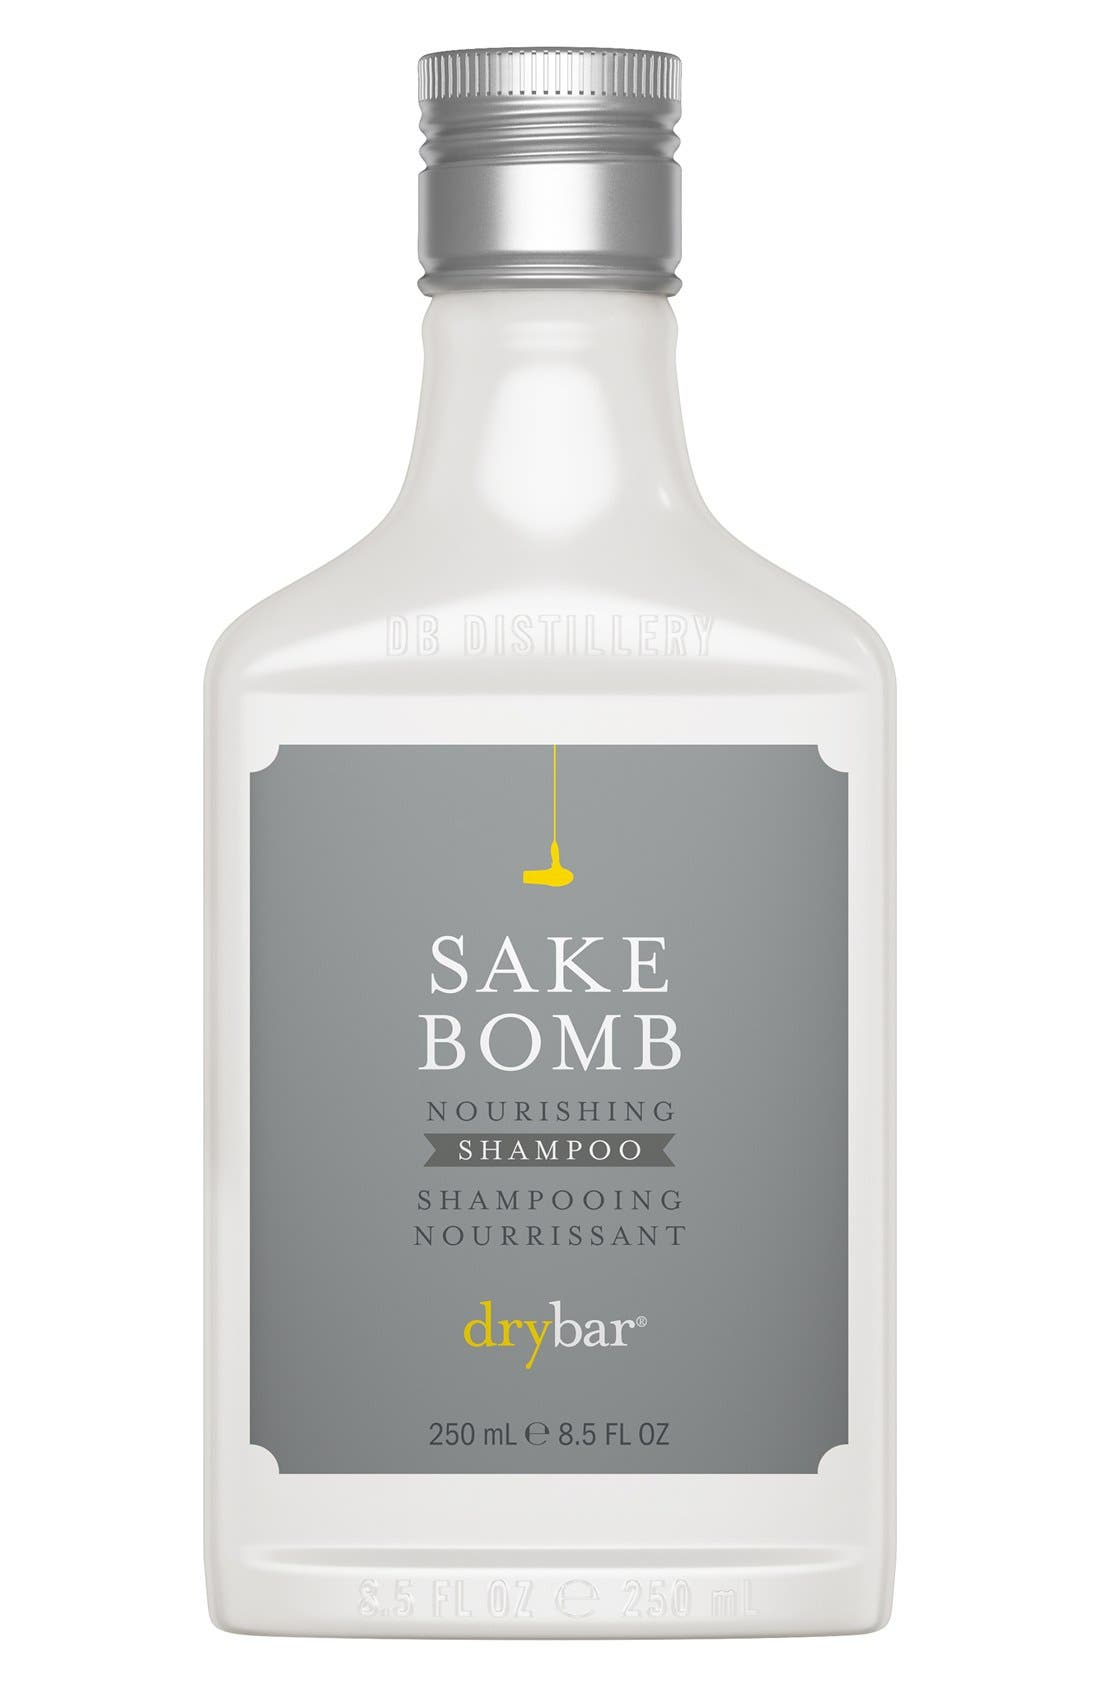 Drybar 'Sake Bomb' Nourishing Shampoo